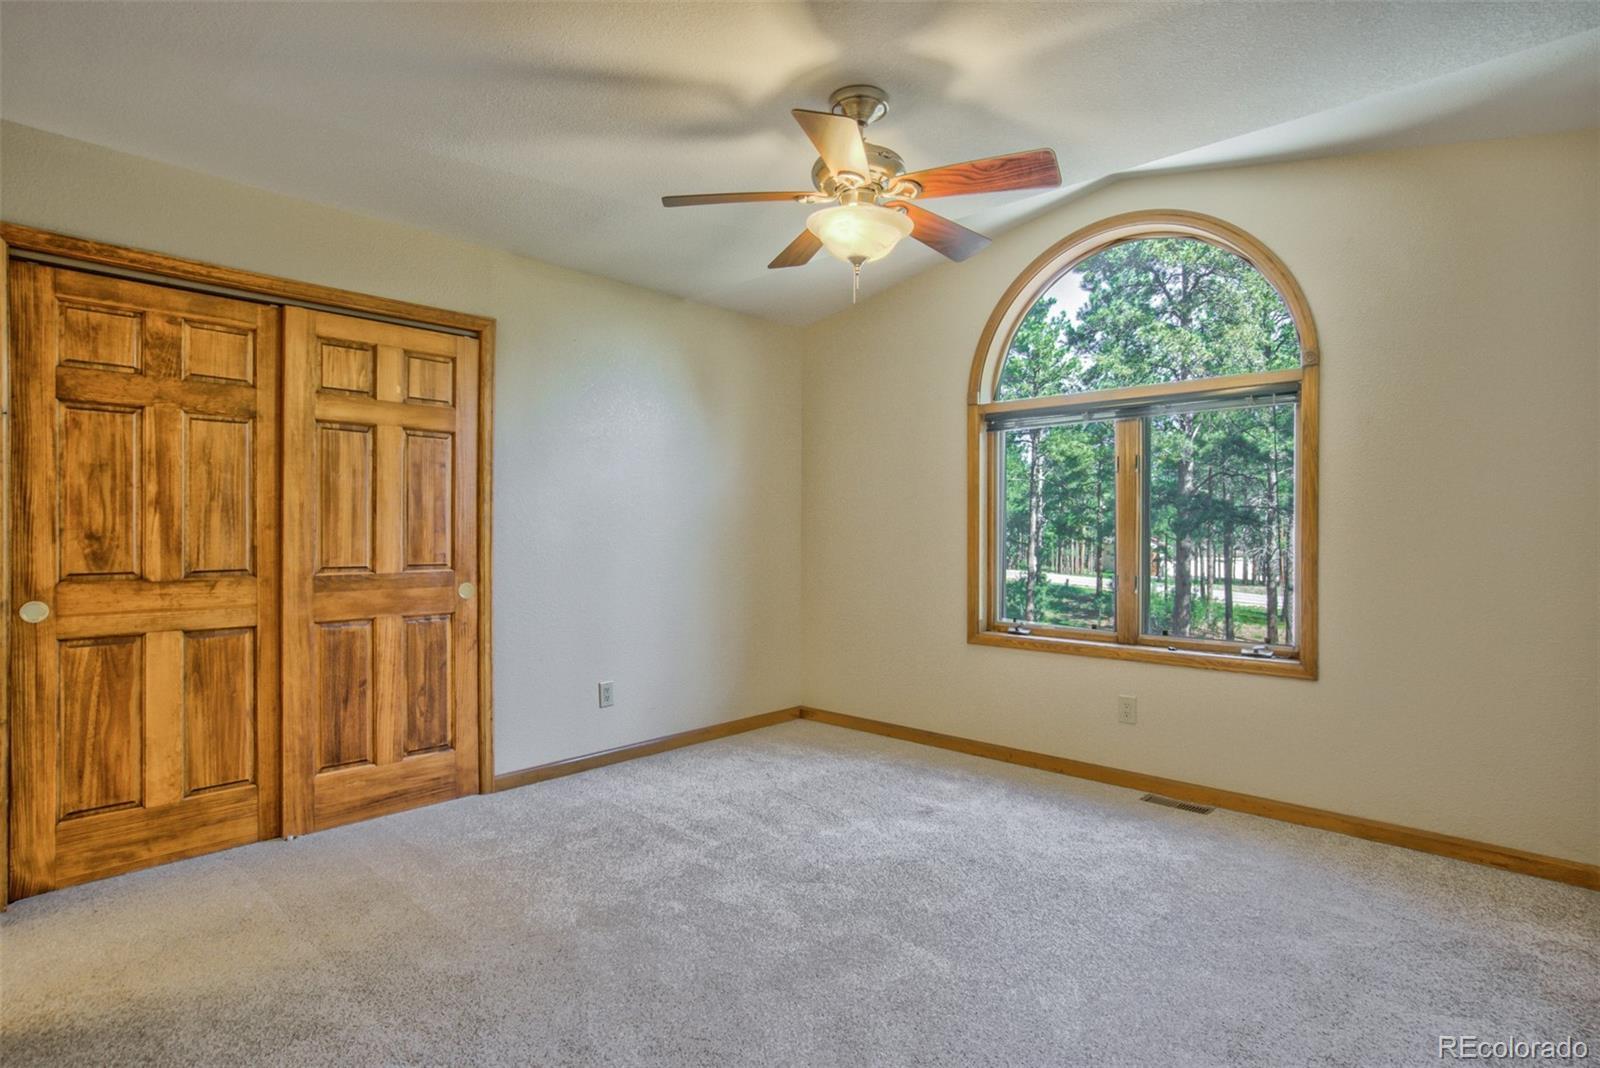 MLS# 2707350 - 35 - 17310 Charter Pines , Colorado Springs, CO 80132